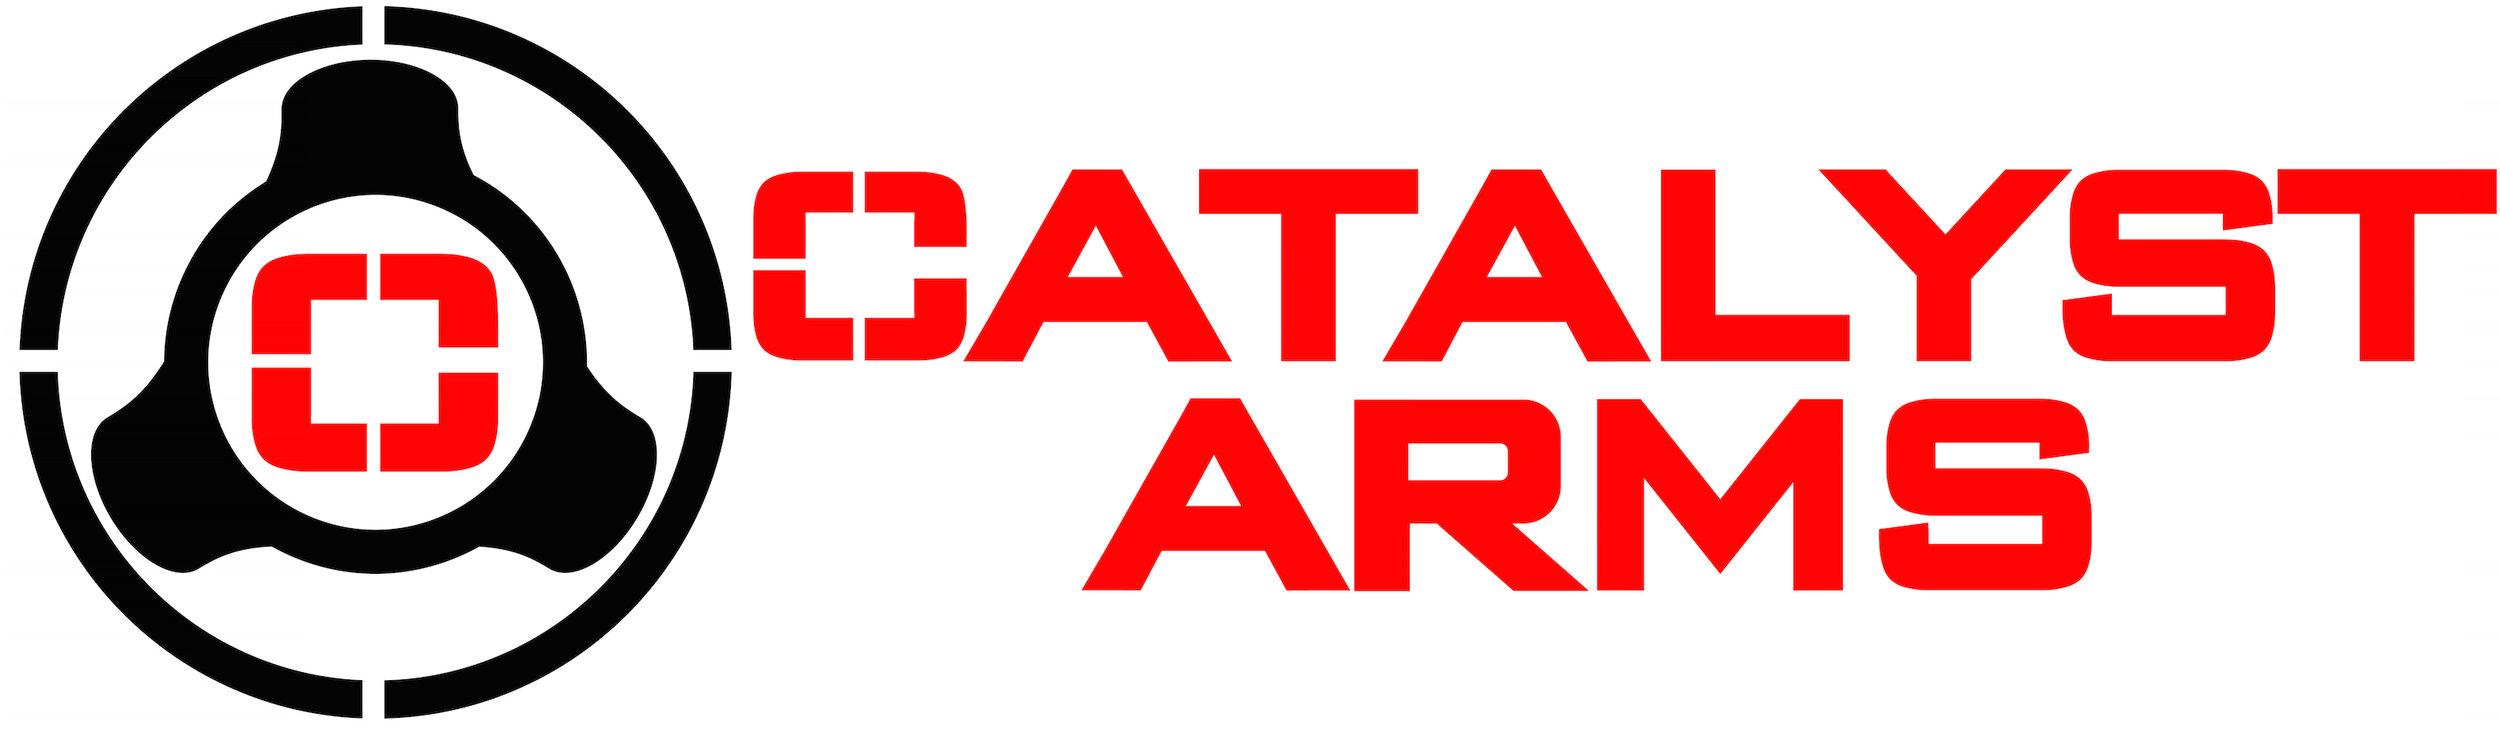 Catalyst Arms Logo Small jpg .jpeg